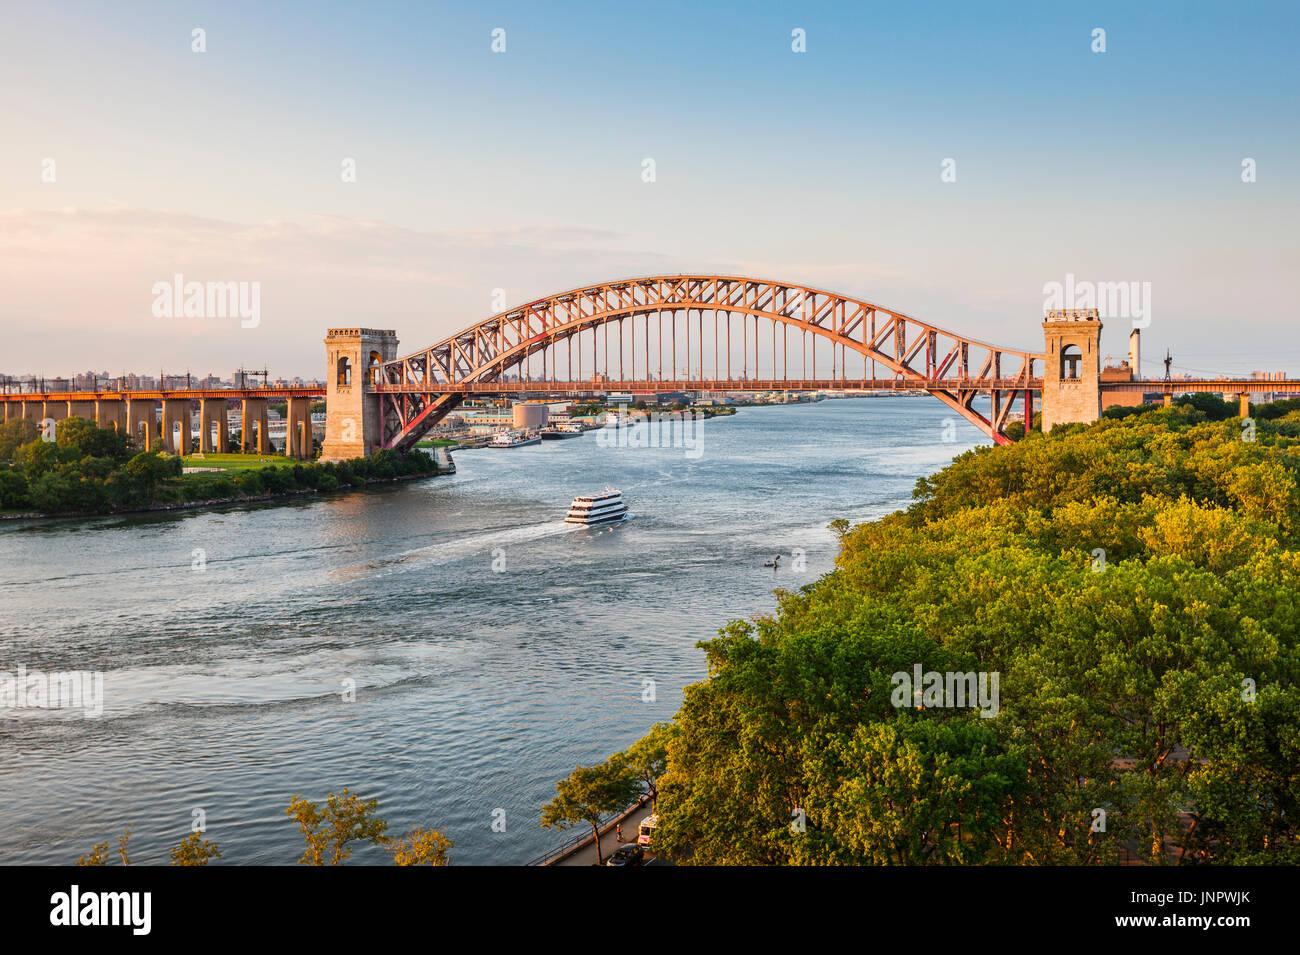 Hell Gate Bridge, near Astoria, park, New York City - Stock Image